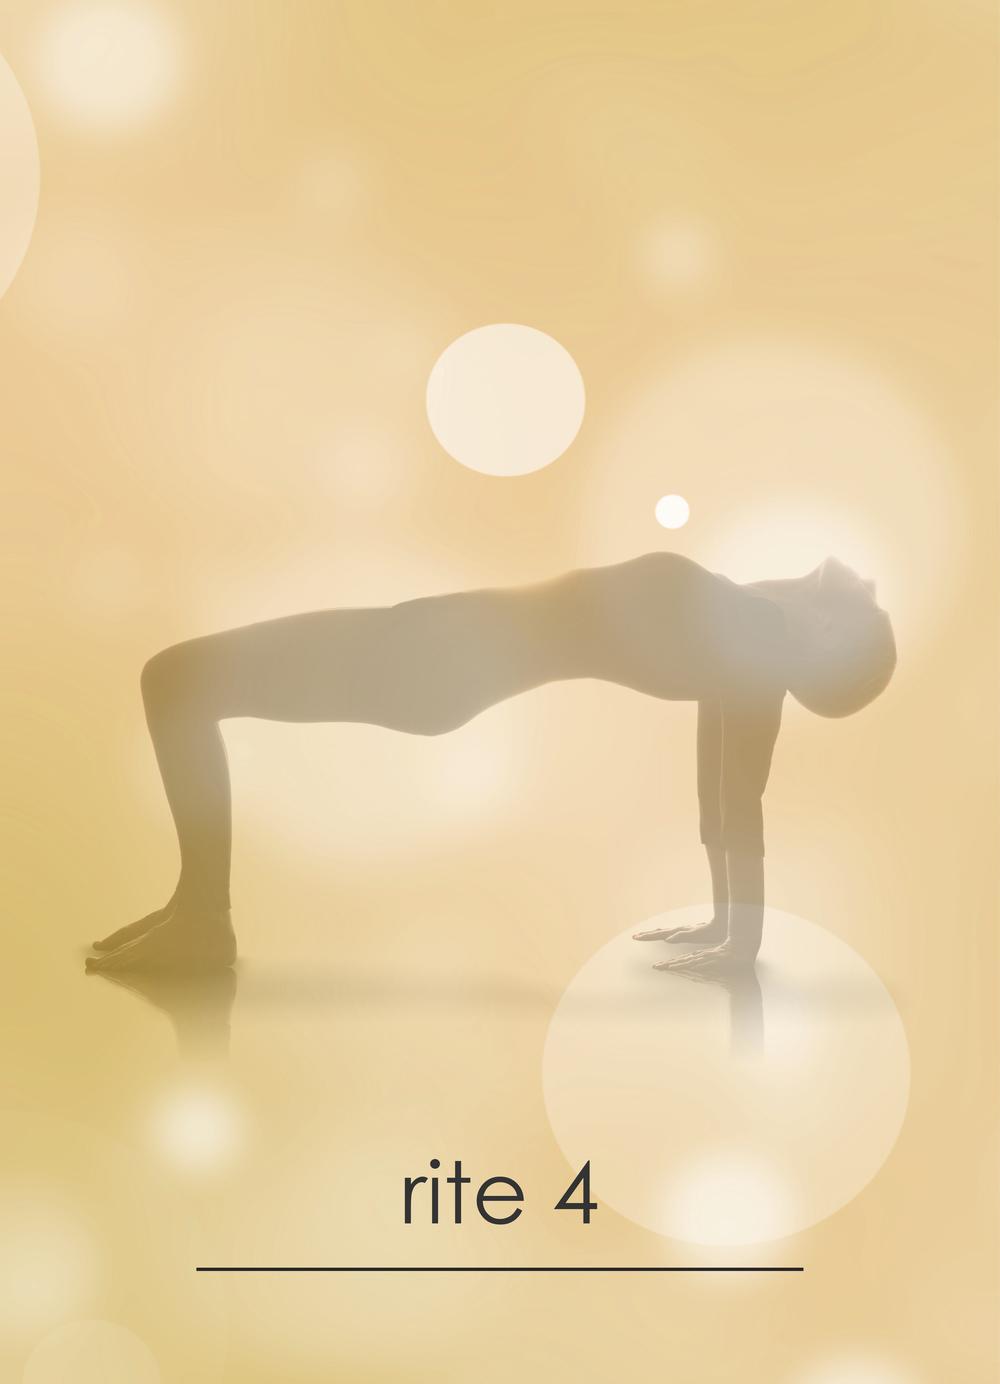 rites_for_life_yoga_rite_4e.jpg